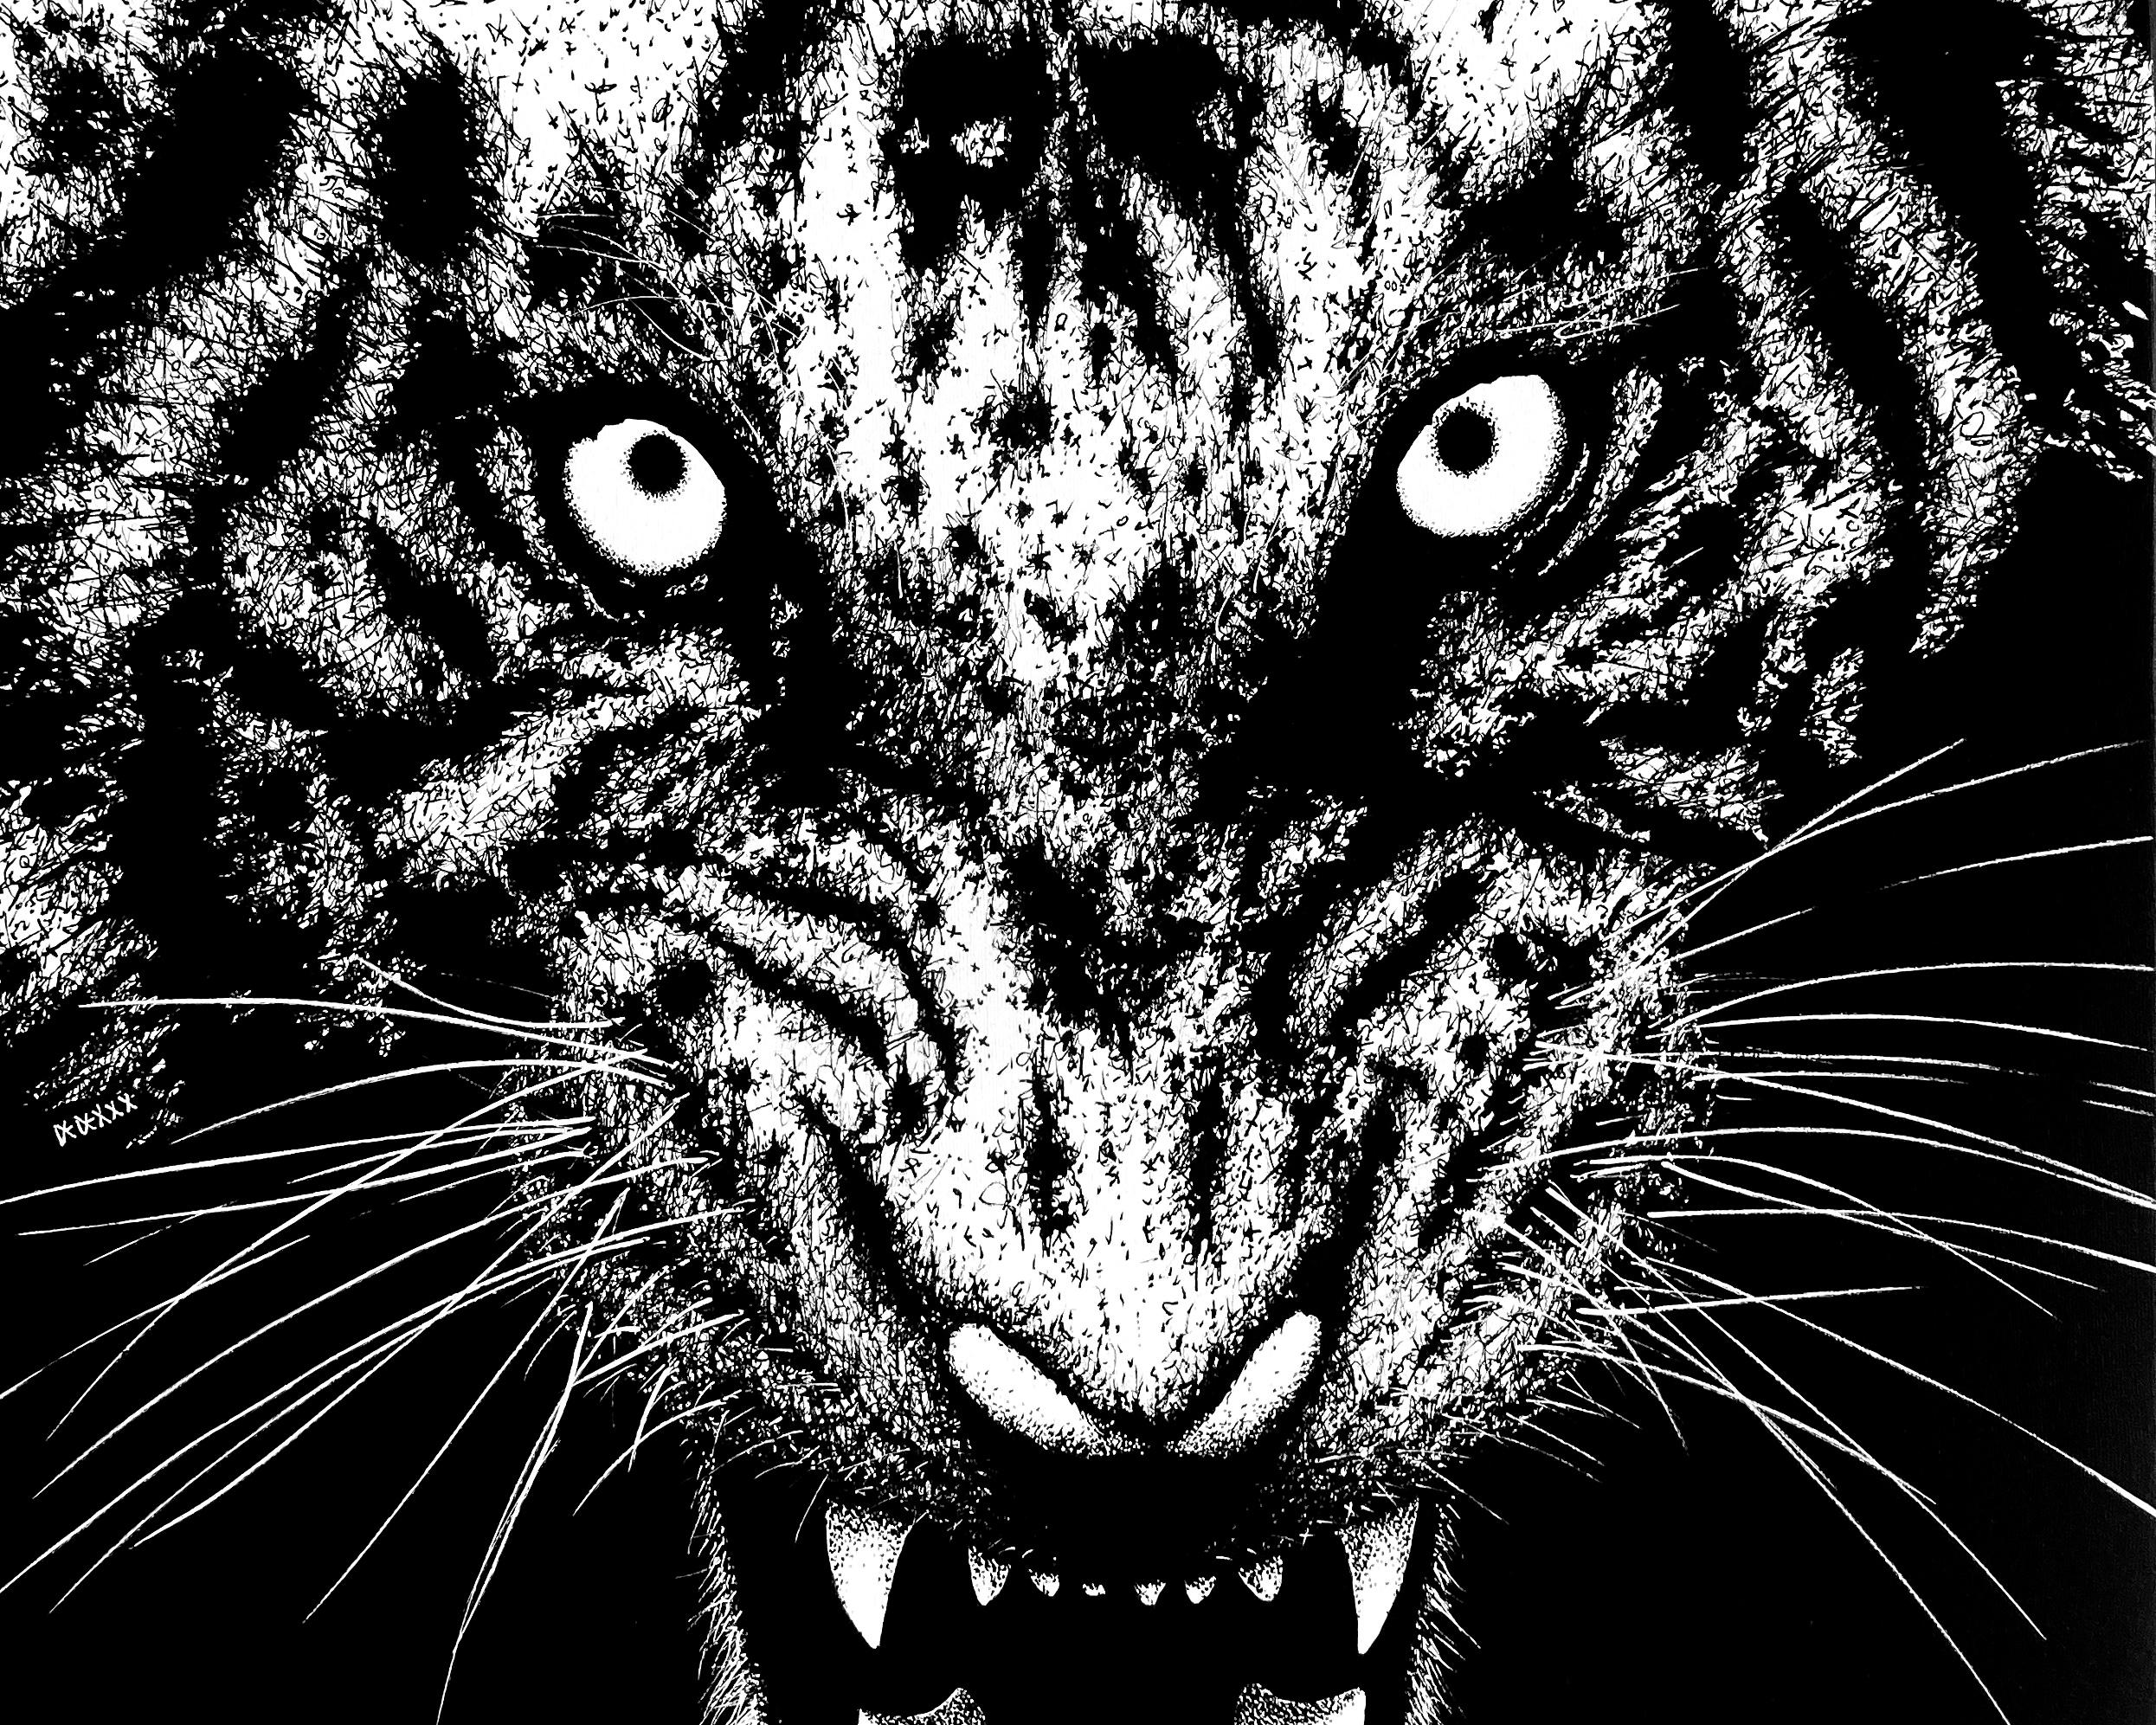 Tiger / Rewild 002